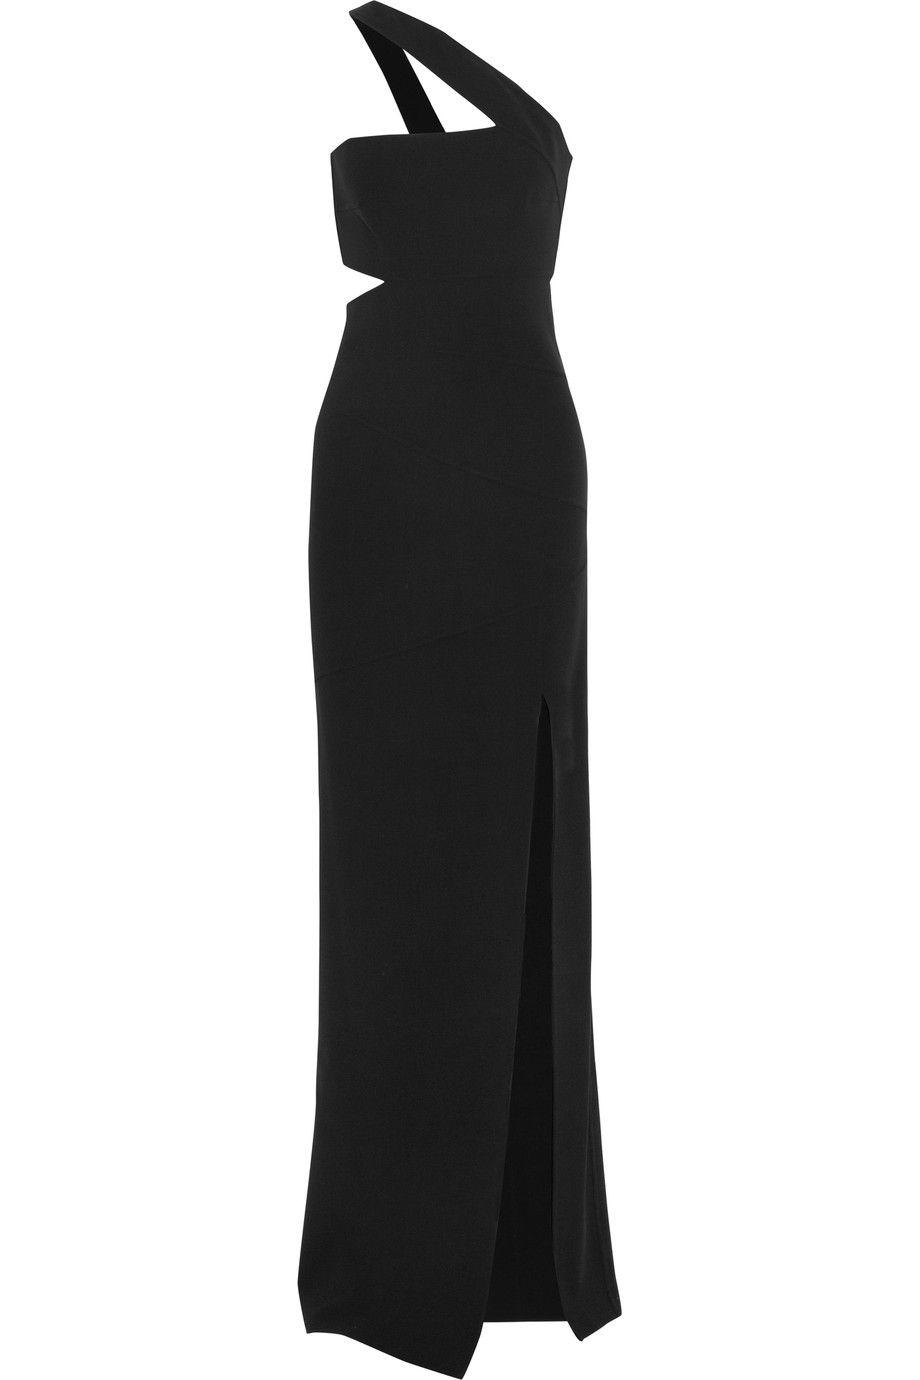 MICHAEL KORS One-Shoulder Stretch-Wool Gown. #michaelkors #cloth ...